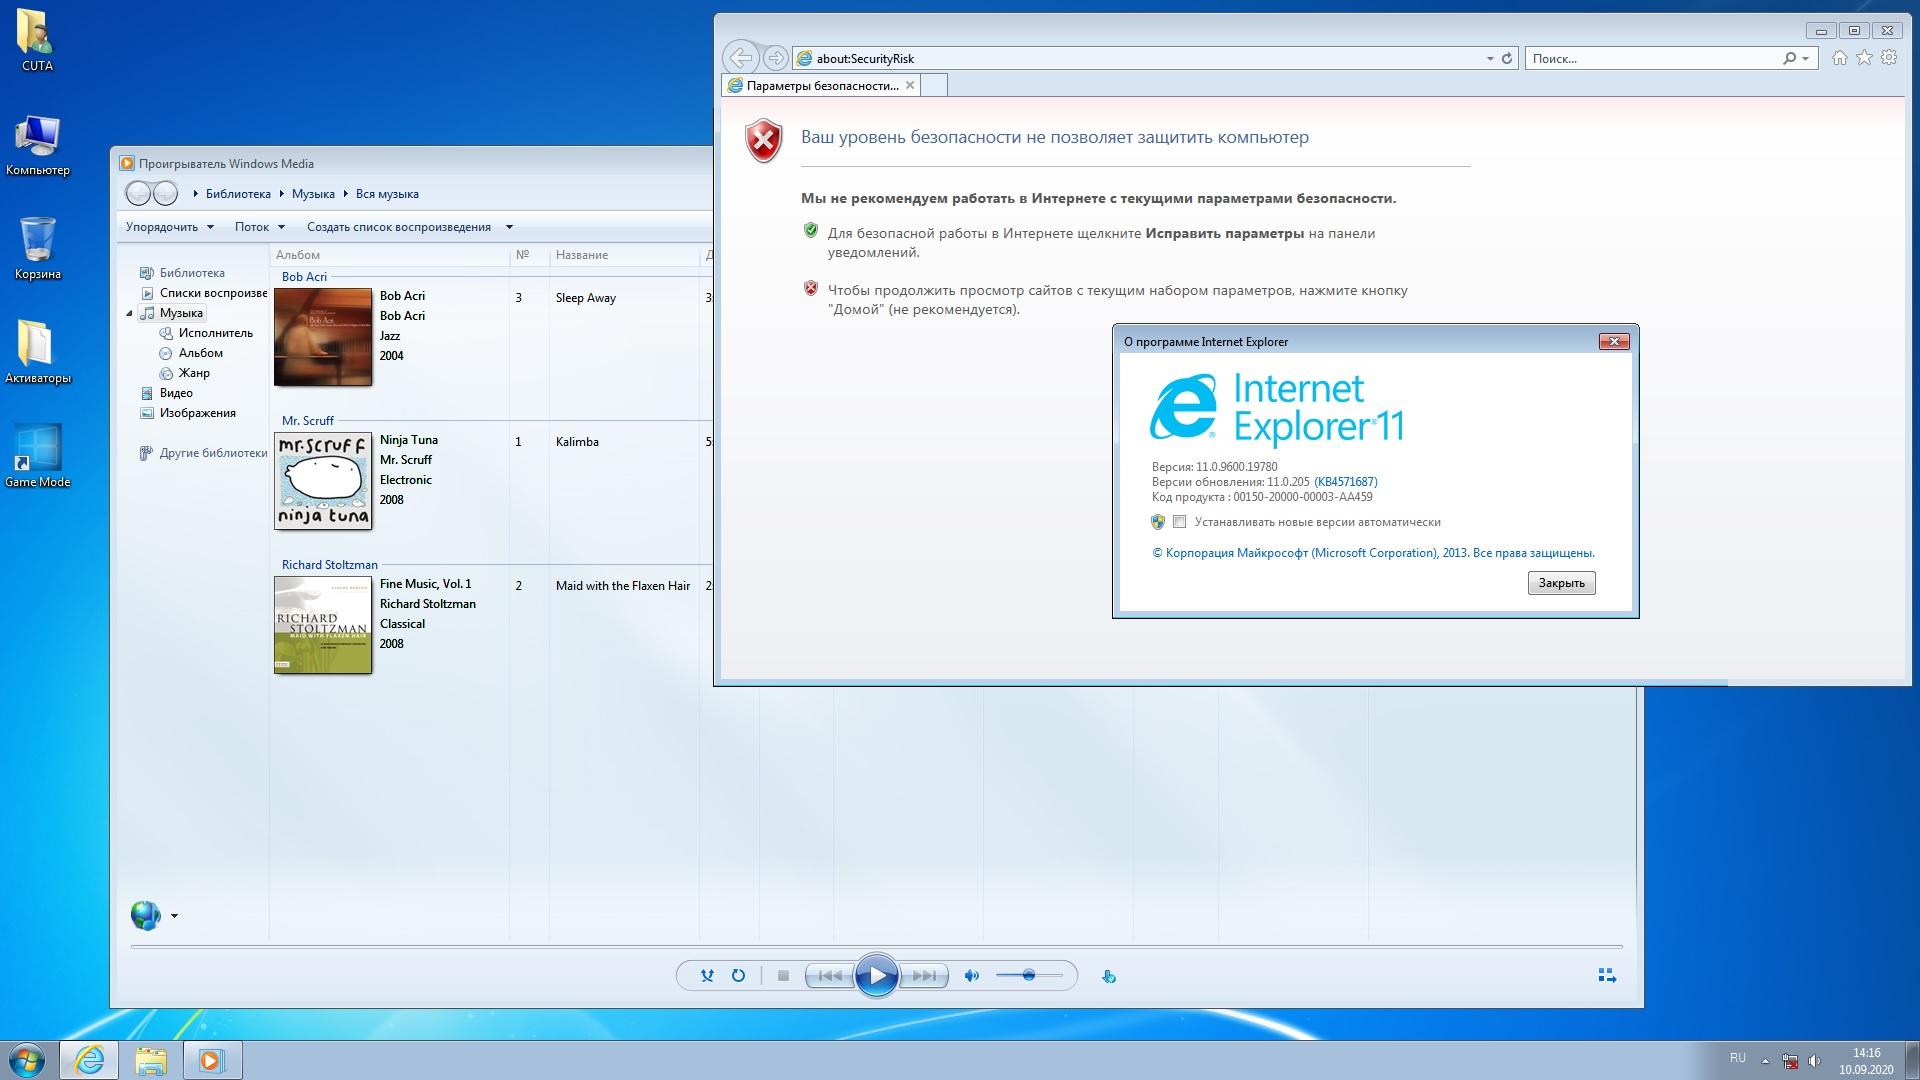 Русская Windows 7 x64 Professional и активатор …